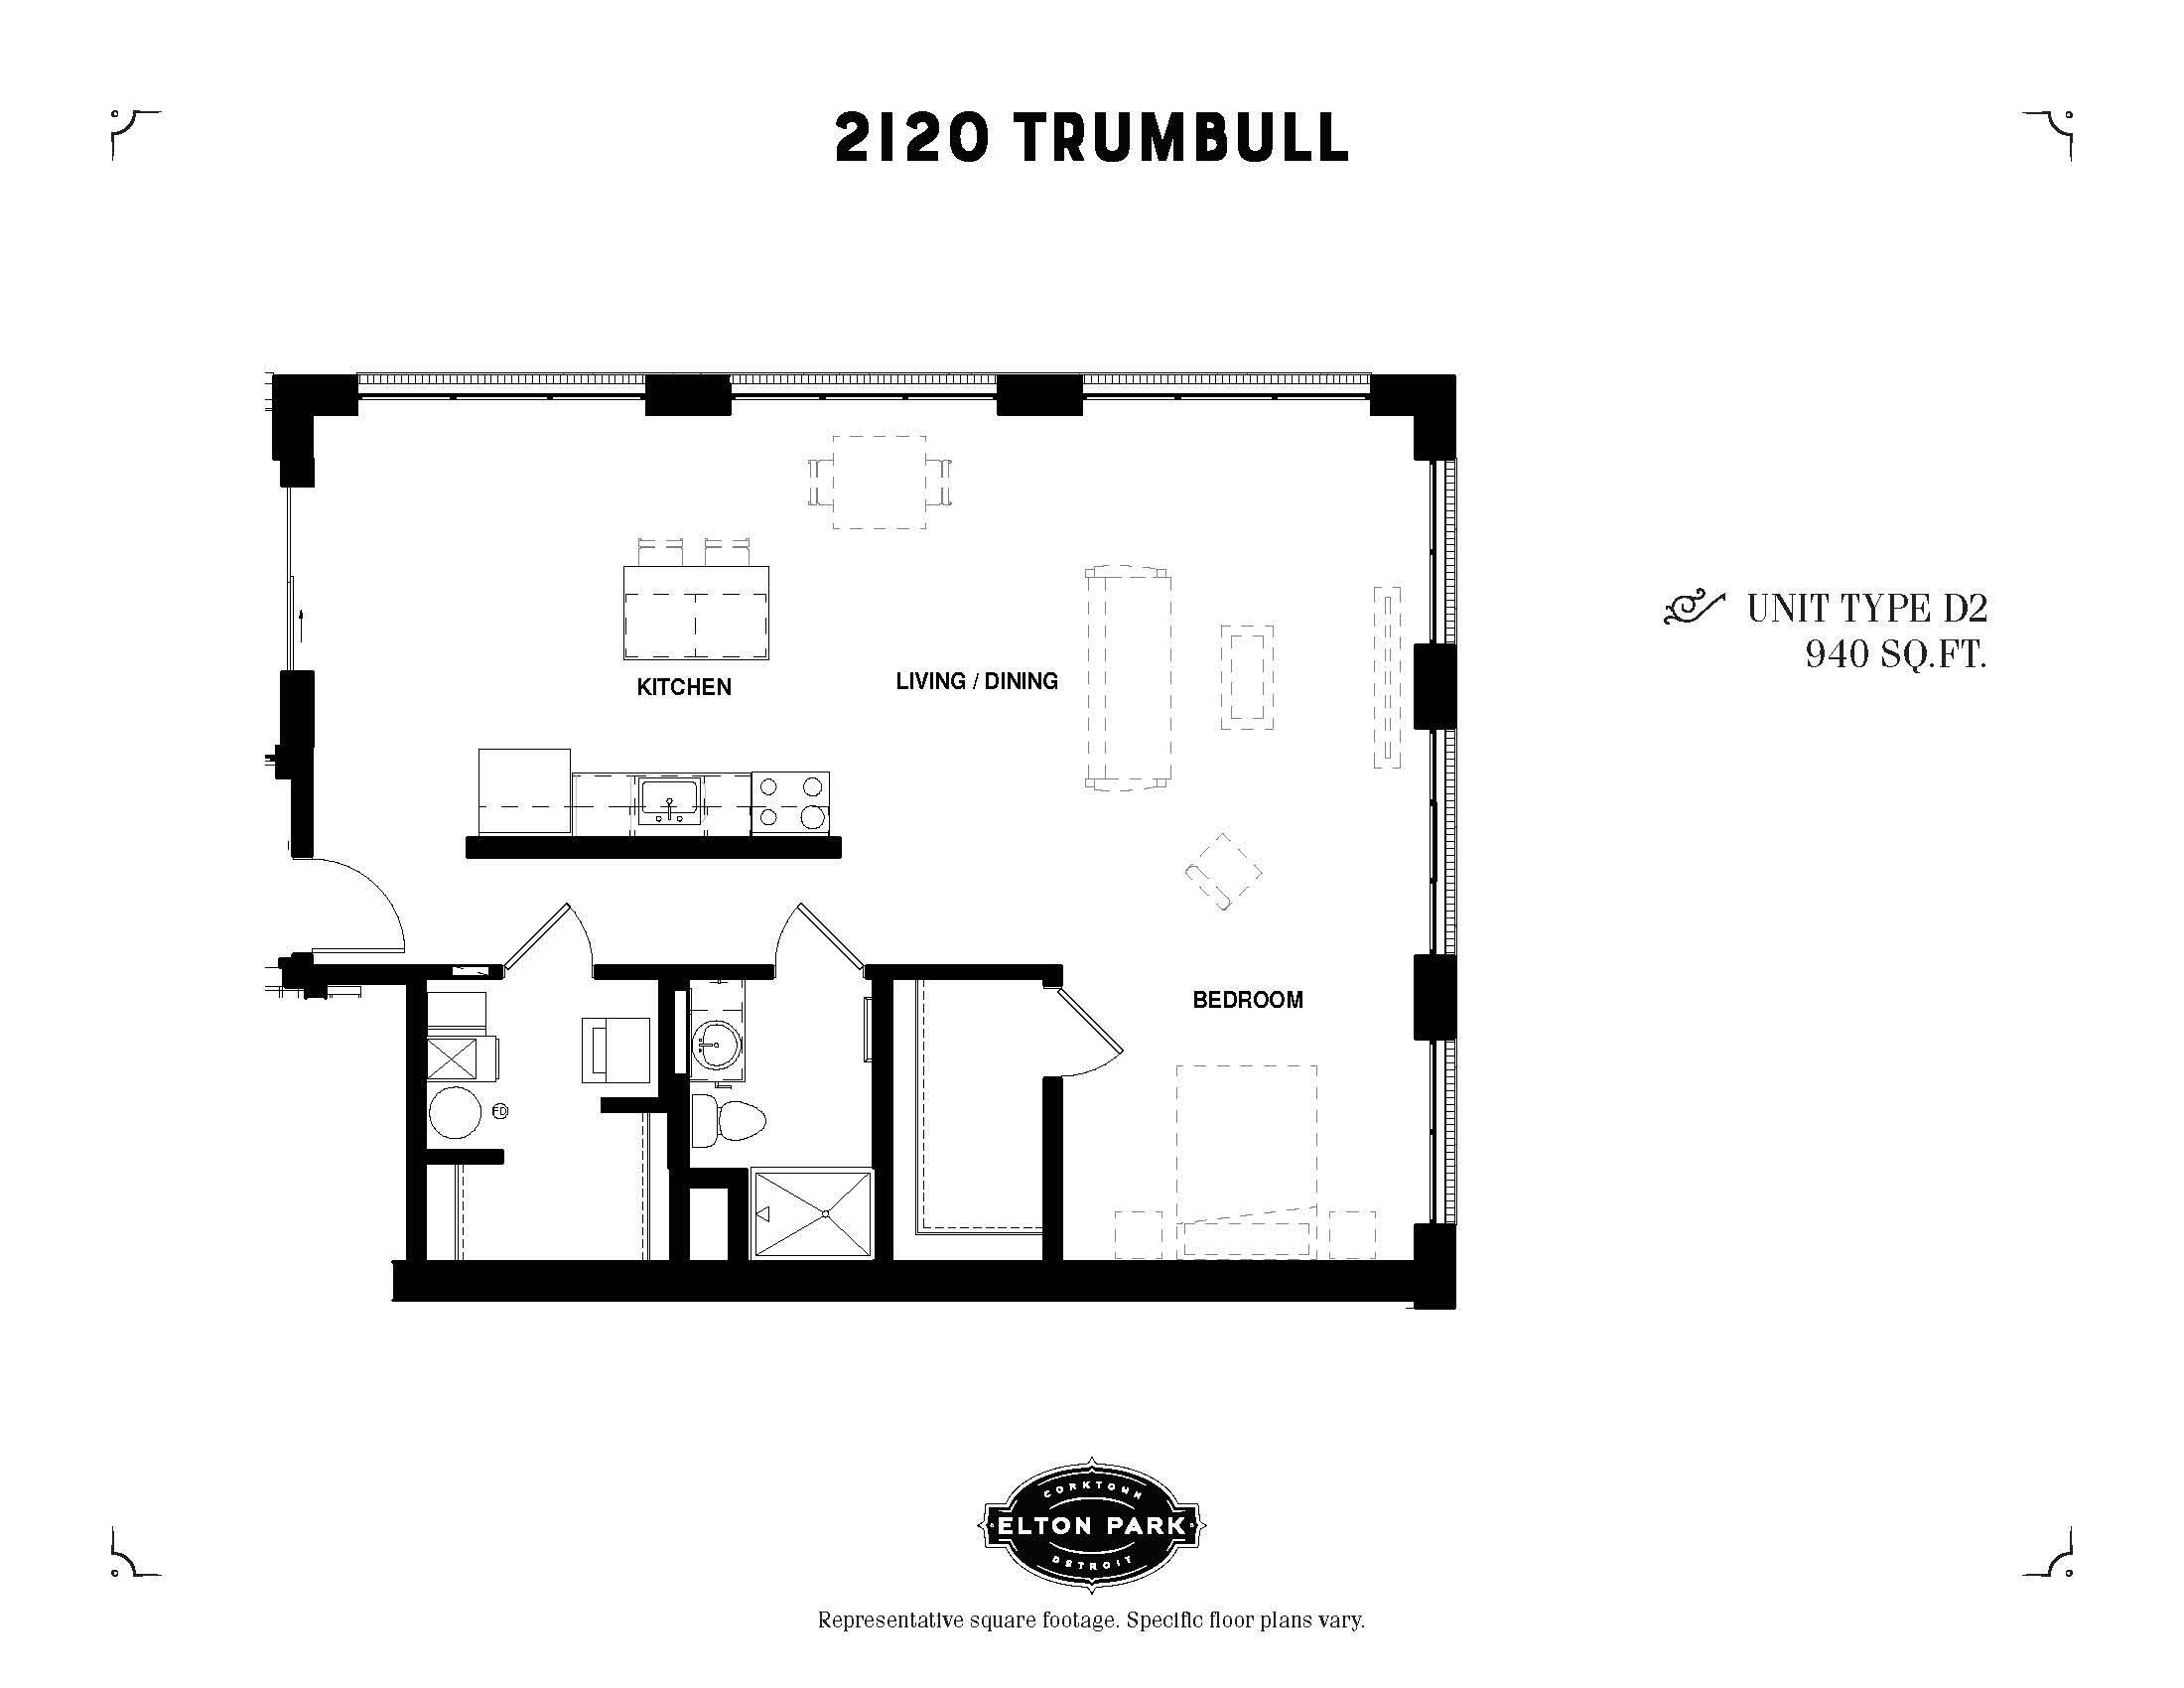 2120 Trumbull Unit Type D2